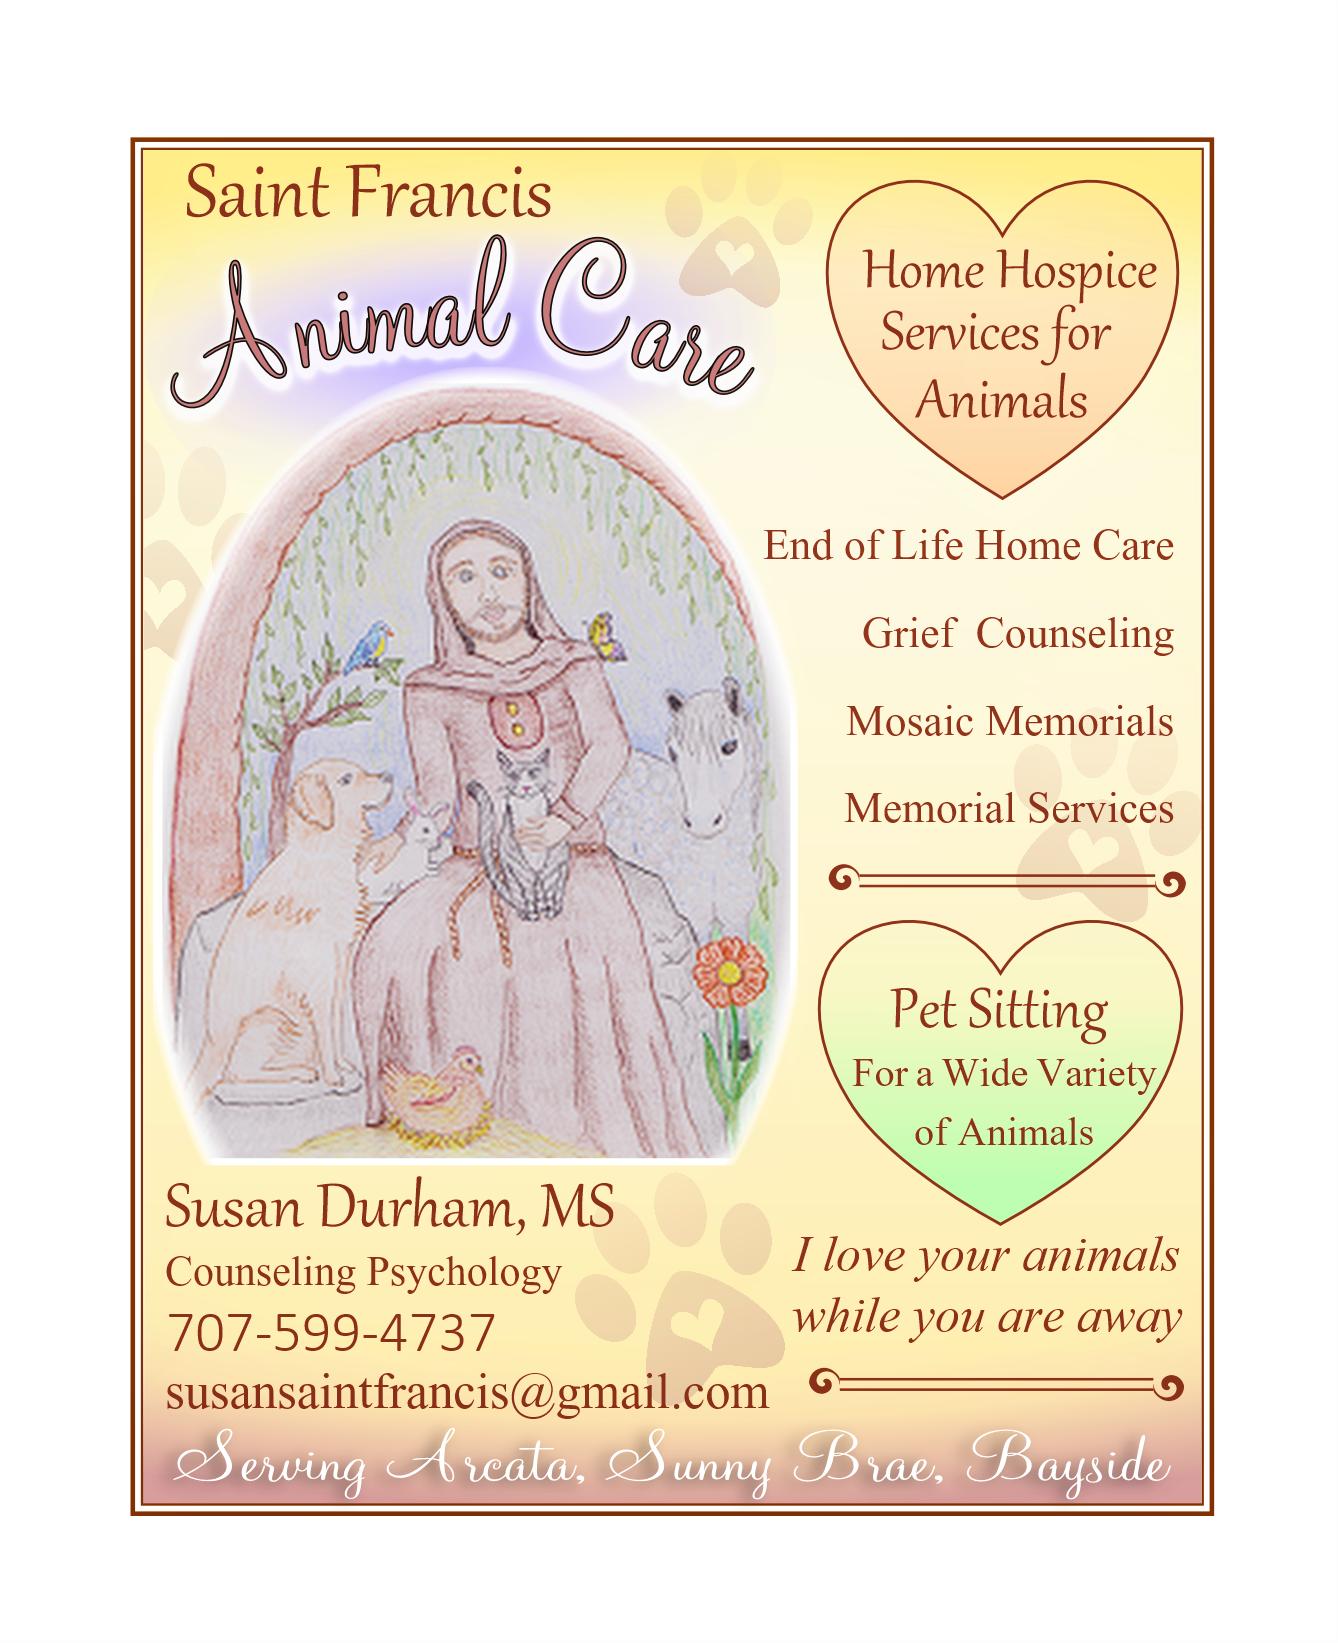 Saint Francis Animal Care Quarter Ad